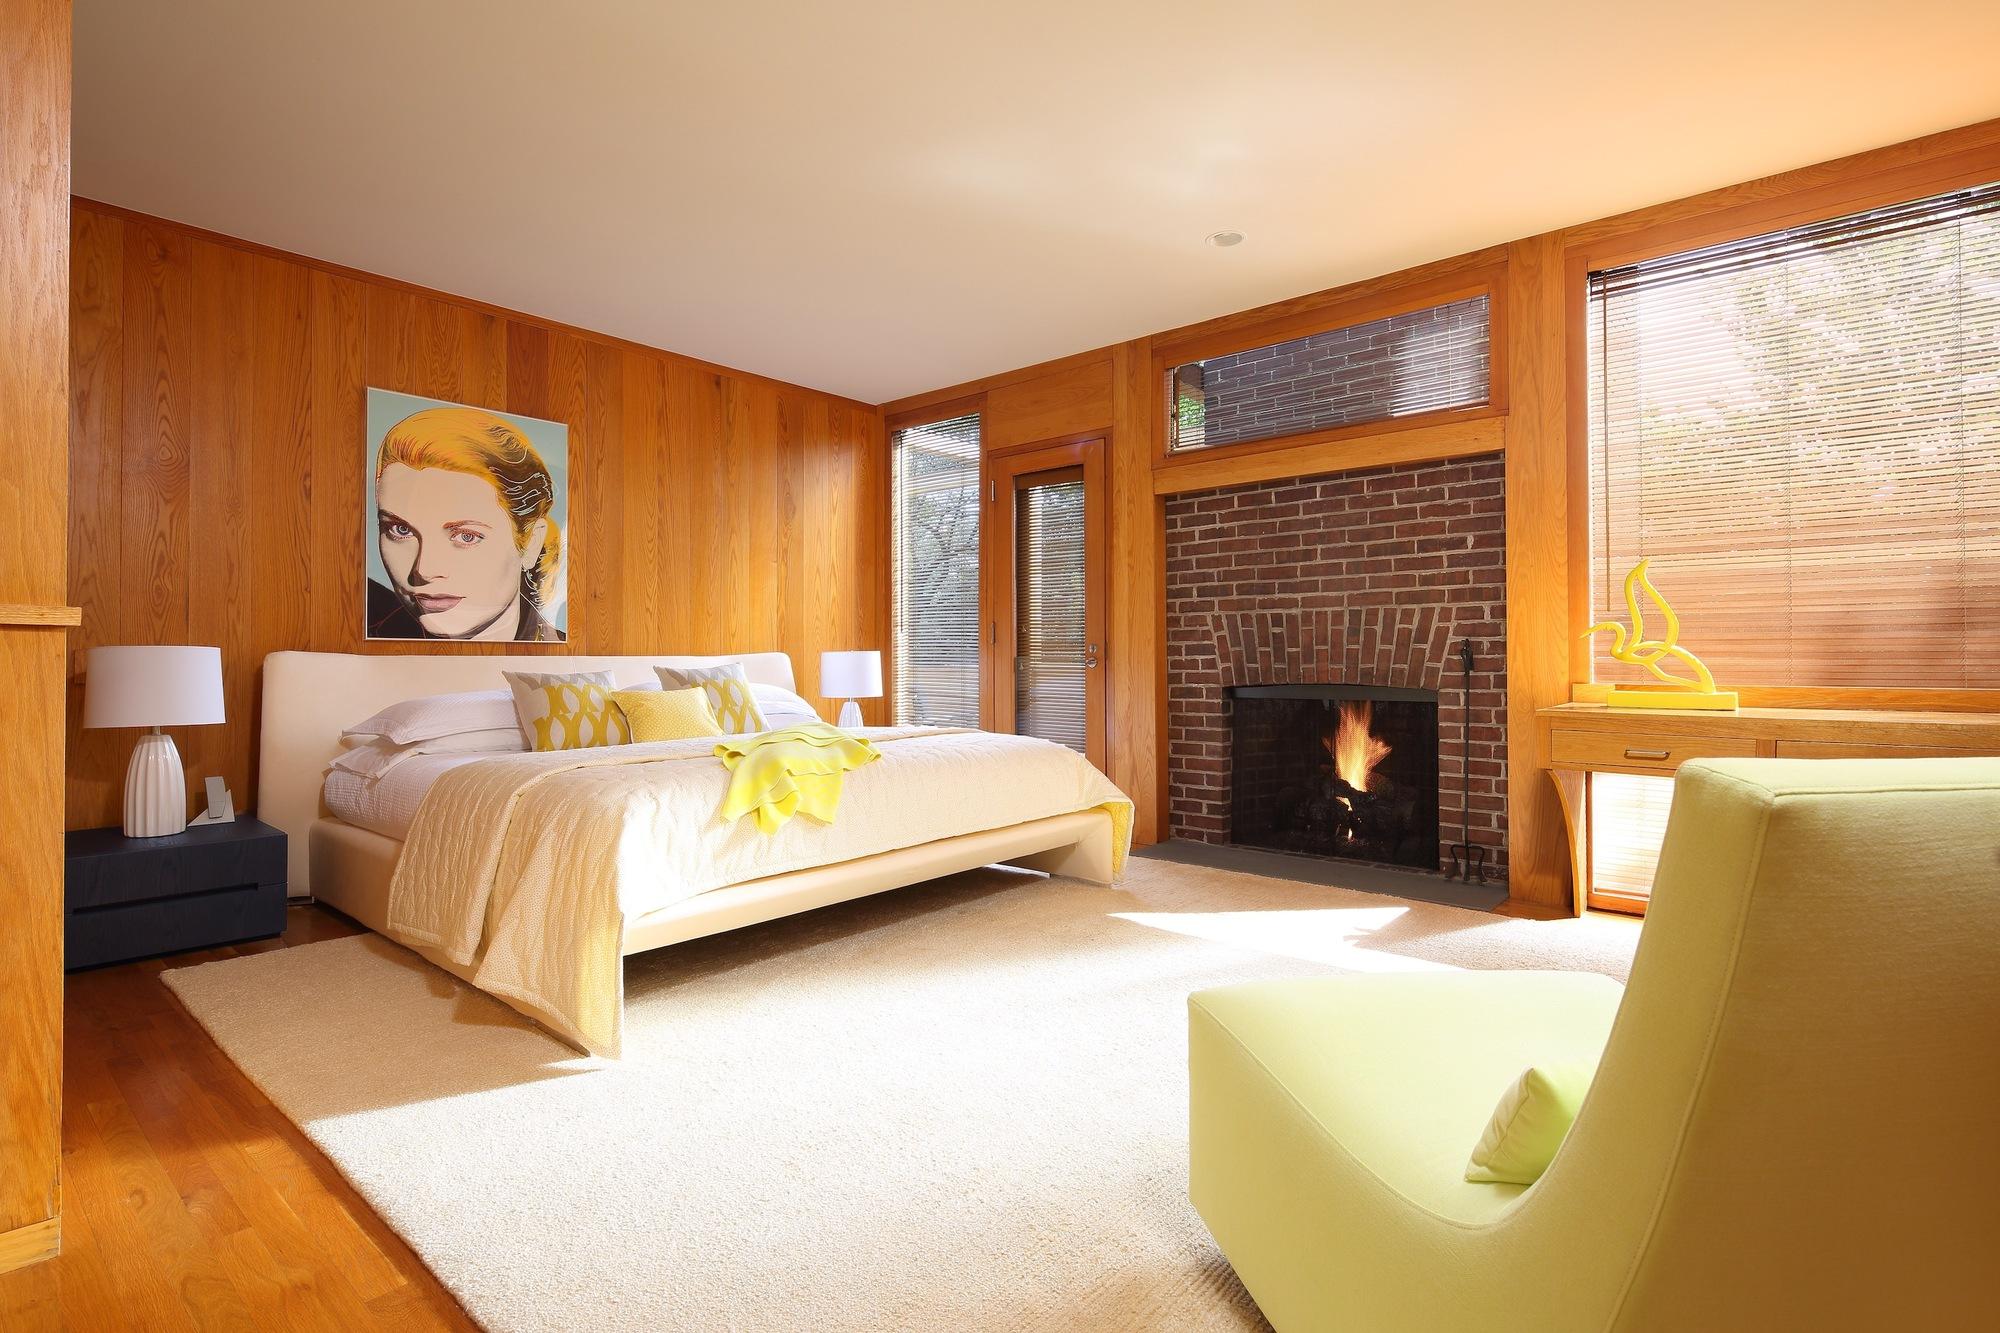 Gallery Of Louis Kahn 39 S Korman Residence Interior Renovation Jennifer Post Design 4